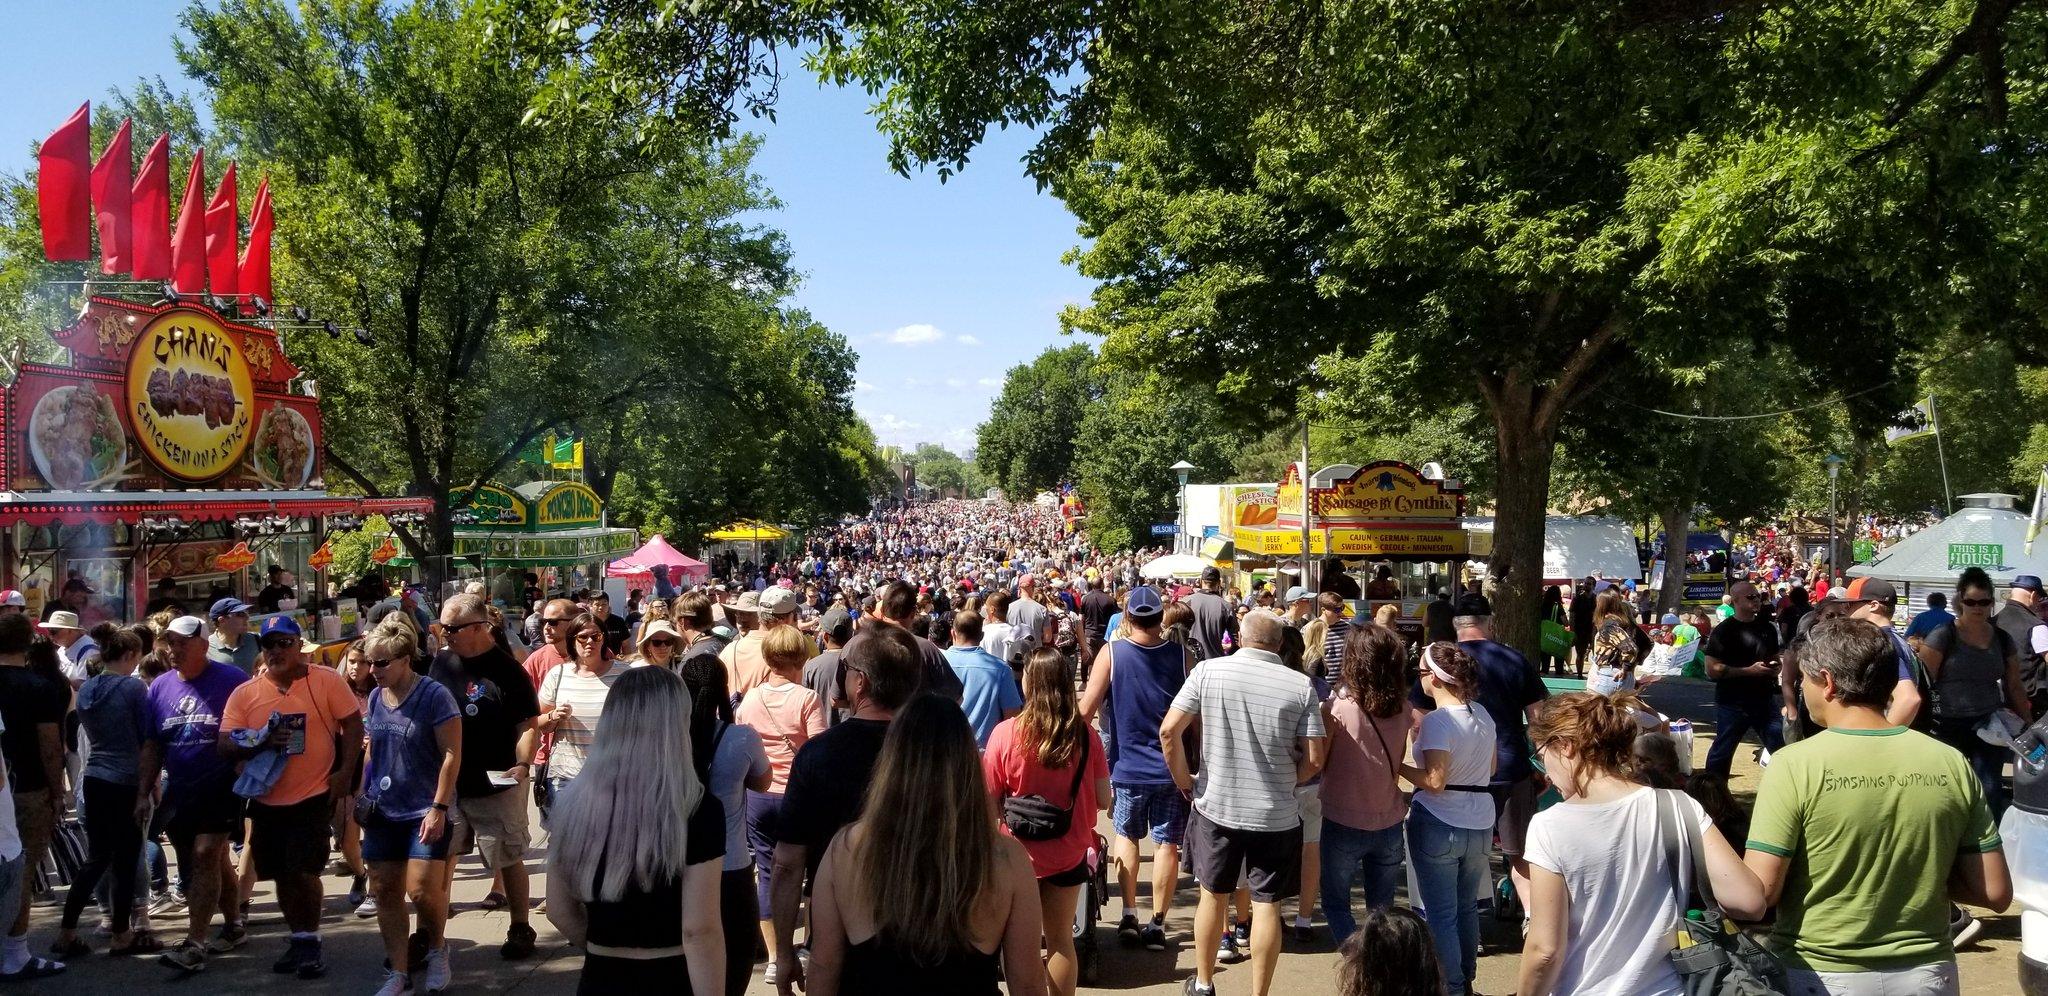 mn-state-fair-2019-hype-https-t-co-xgn7ytoijc